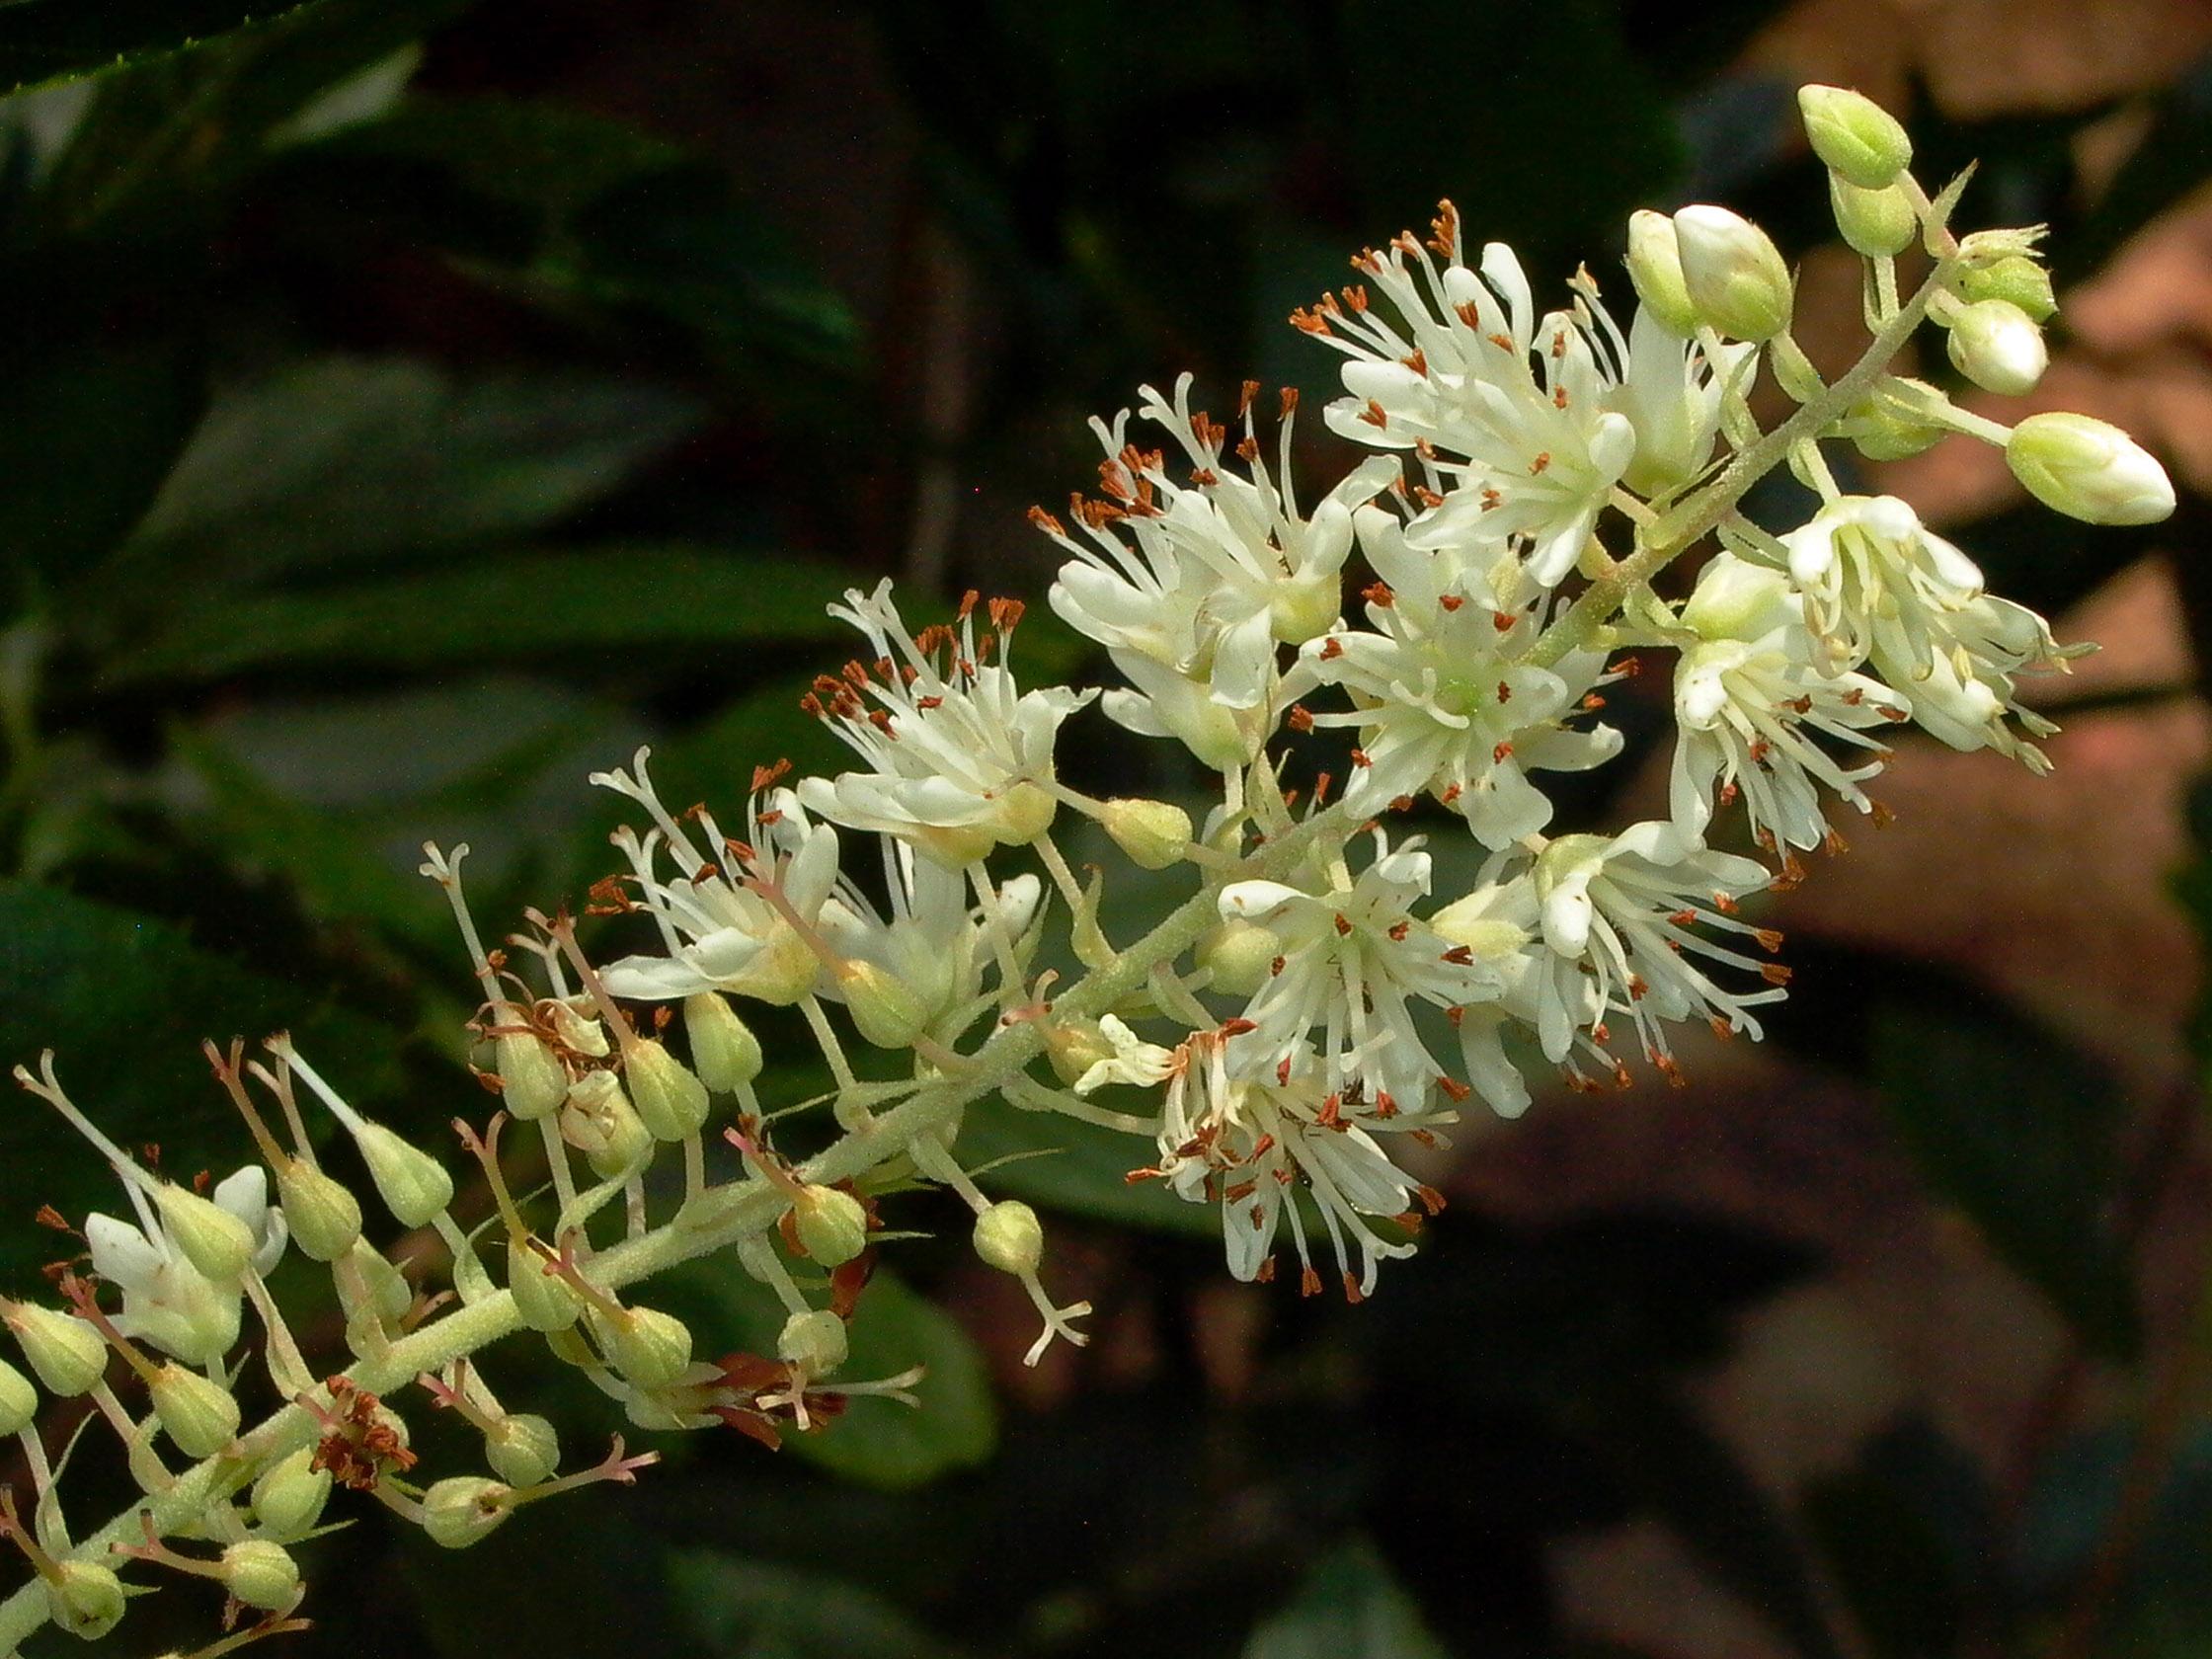 Quarry Shade Garden At Bon Air Park: SHRUB: Clethra Alnifolia (Sweet Pepperbush, Summersweet